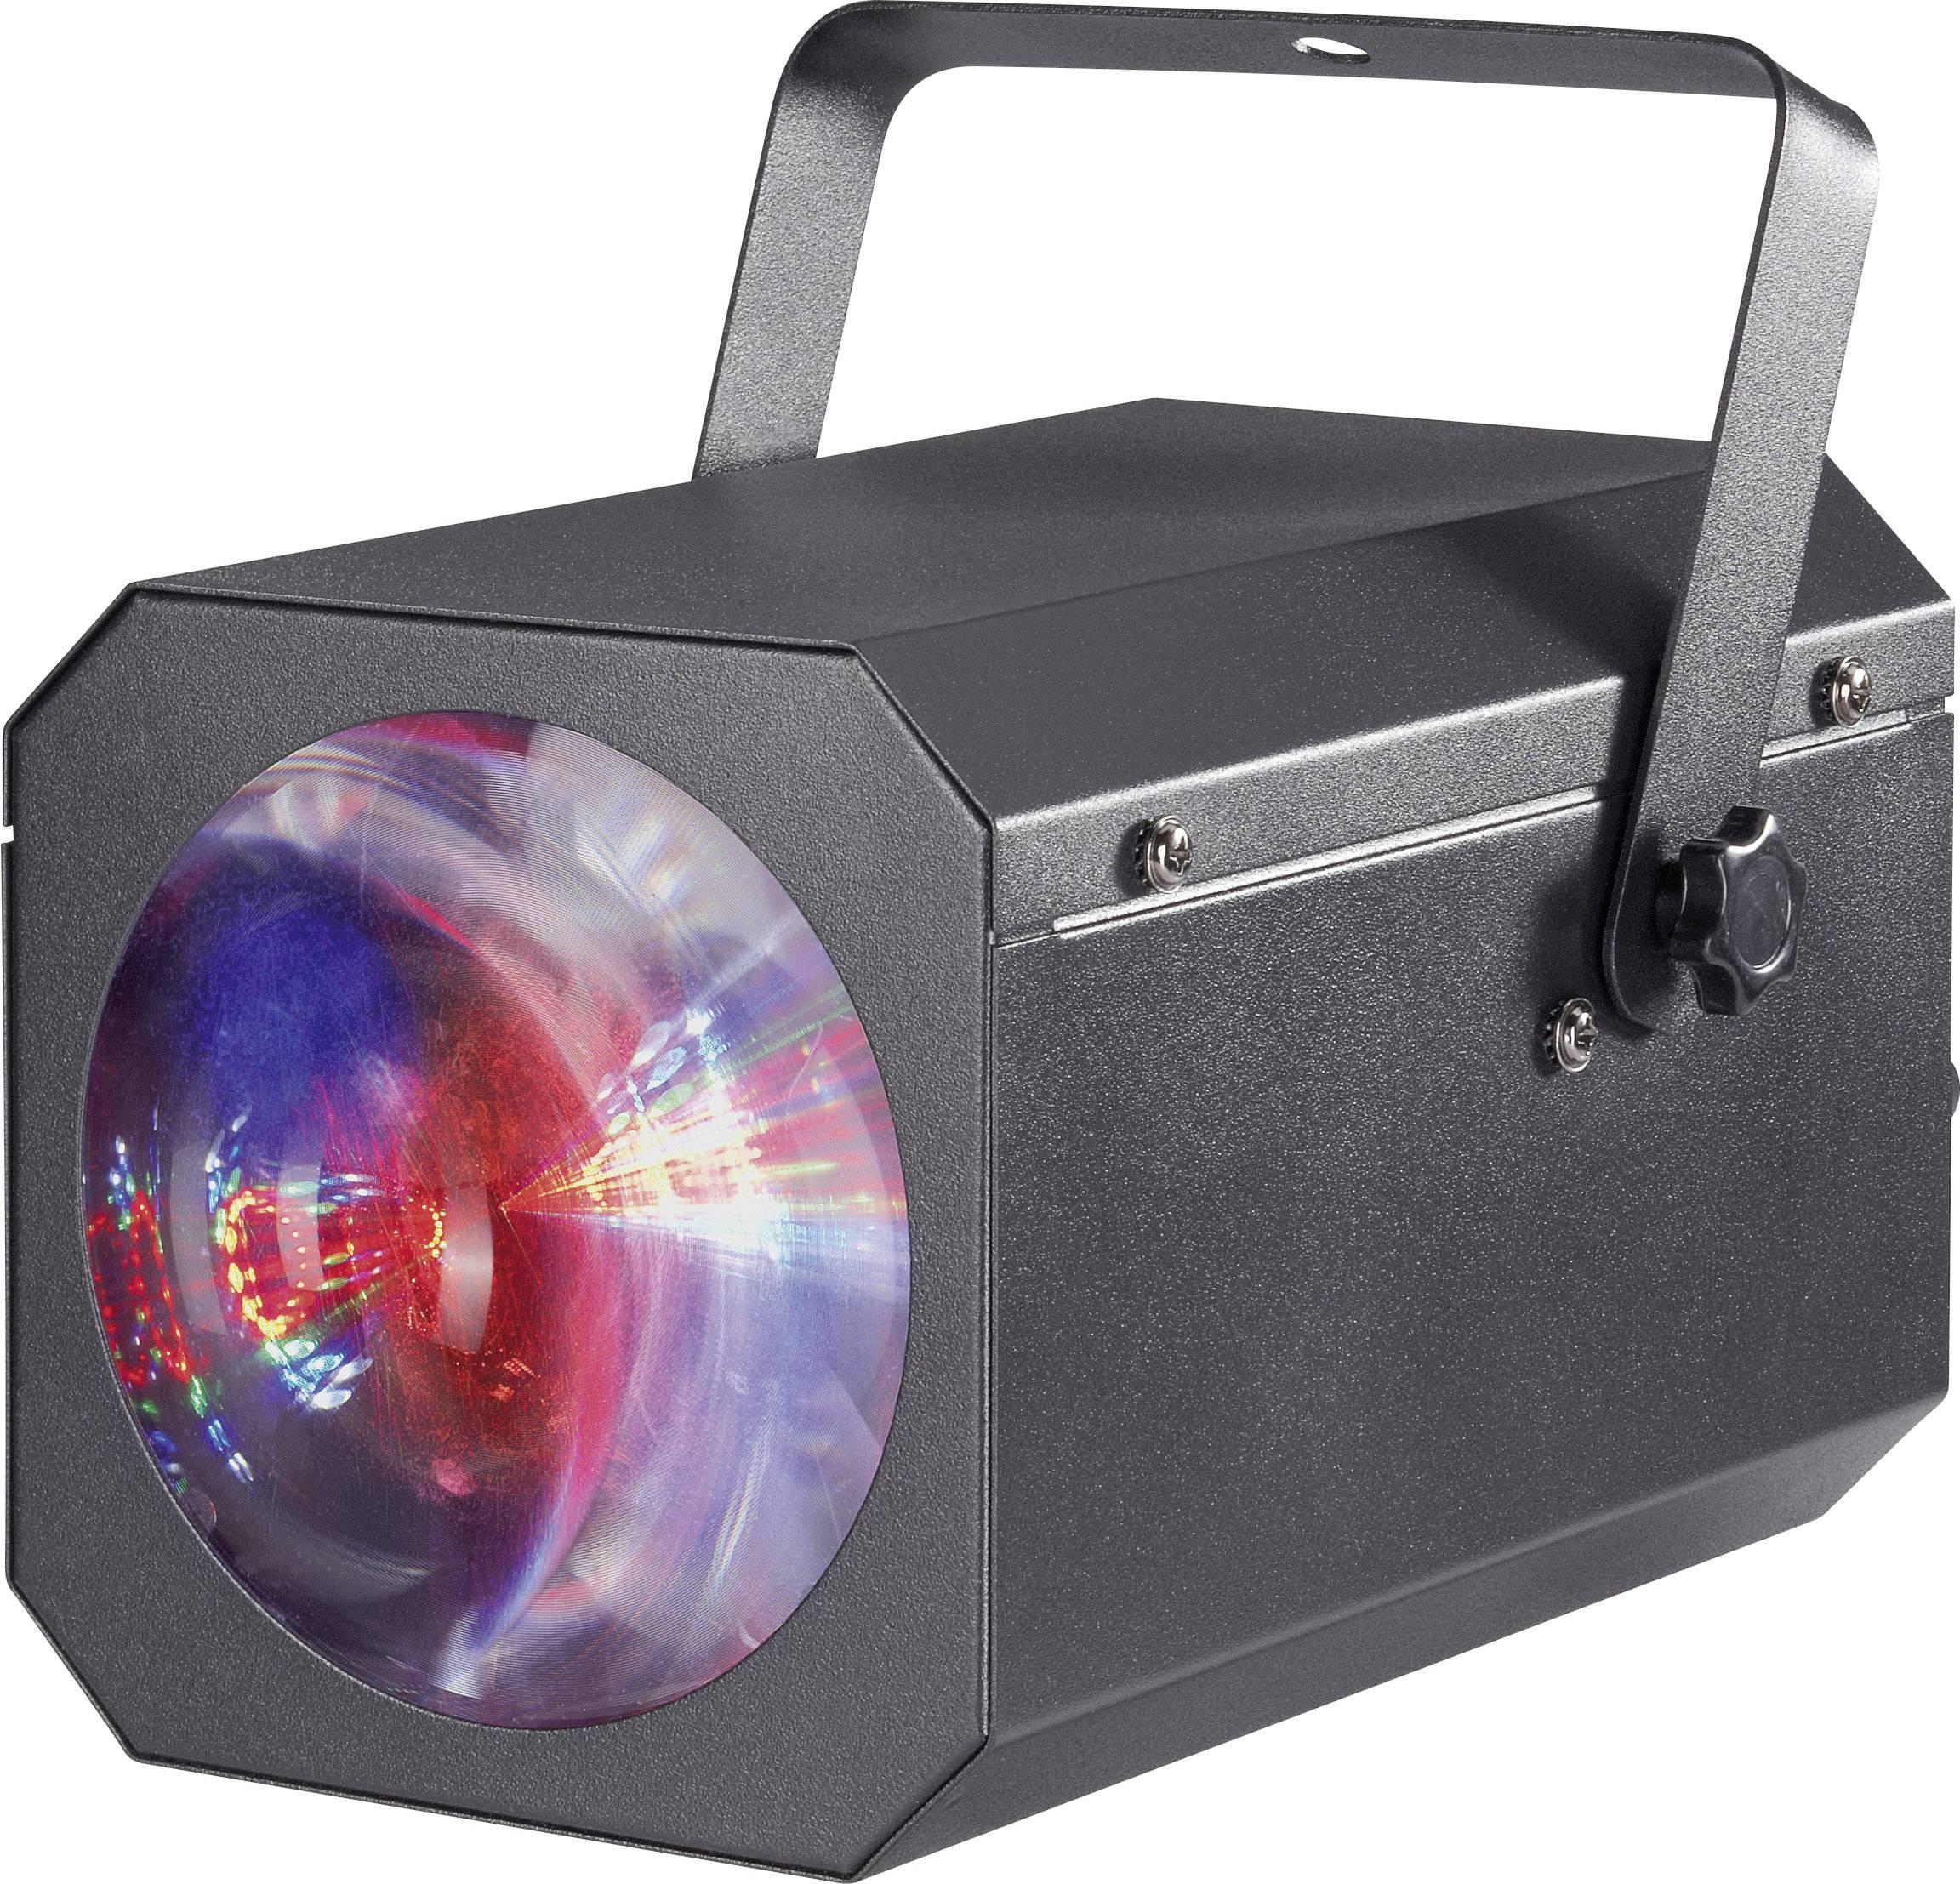 DMX LED efektový reflektor Mc Crypt DL-1114S DL-1114S, počet LED 64 x